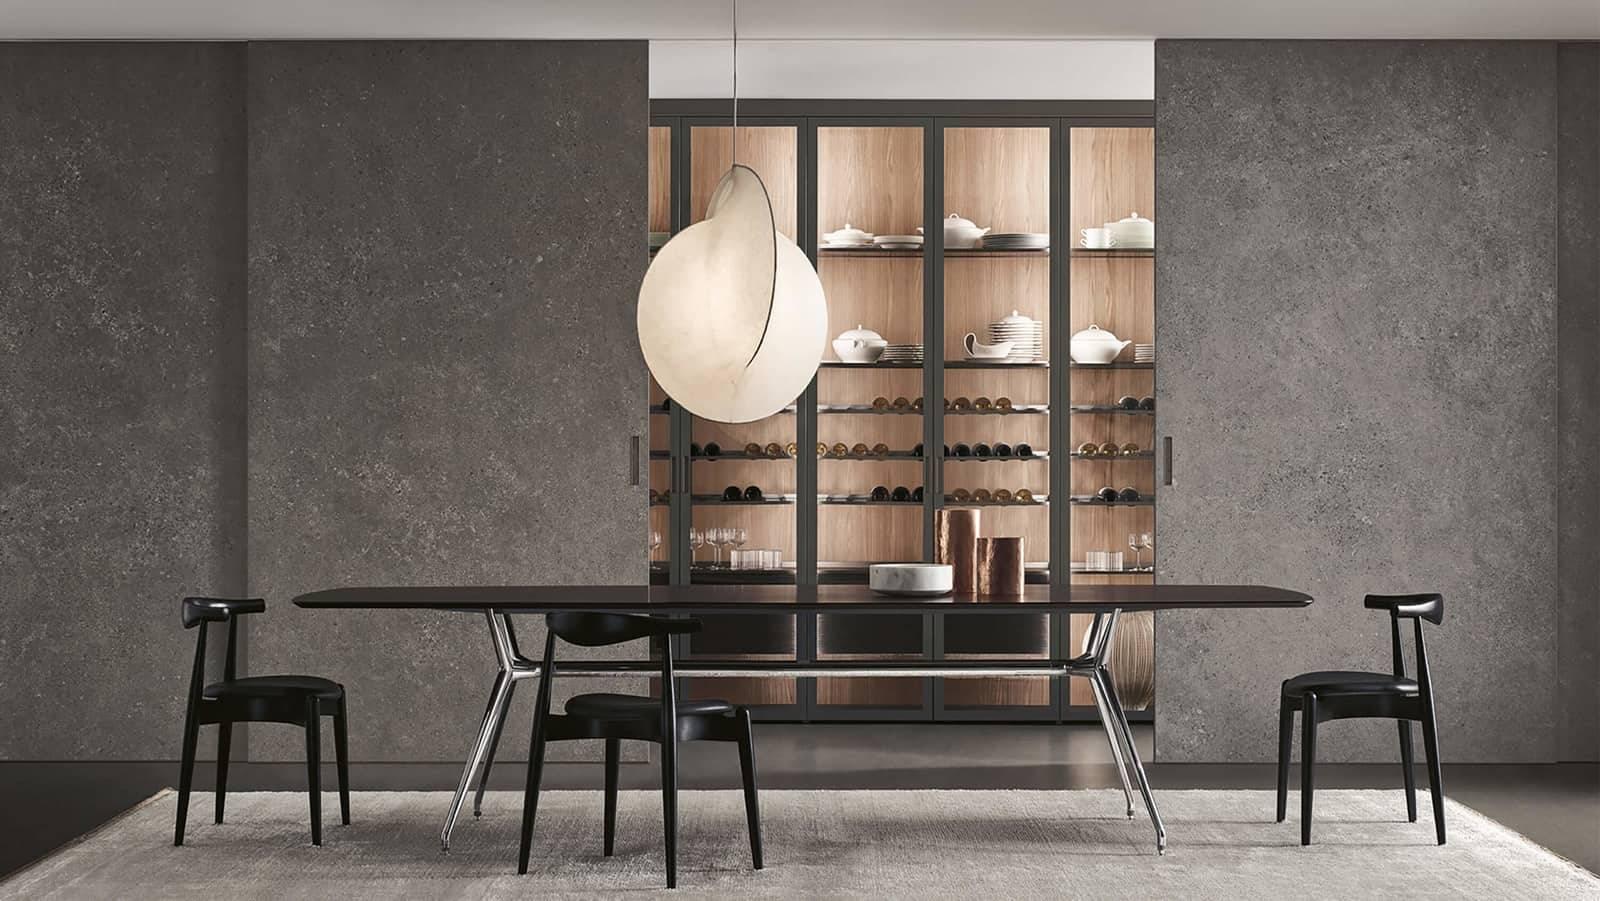 rimadesio manta italiaanse design tafel houten blad